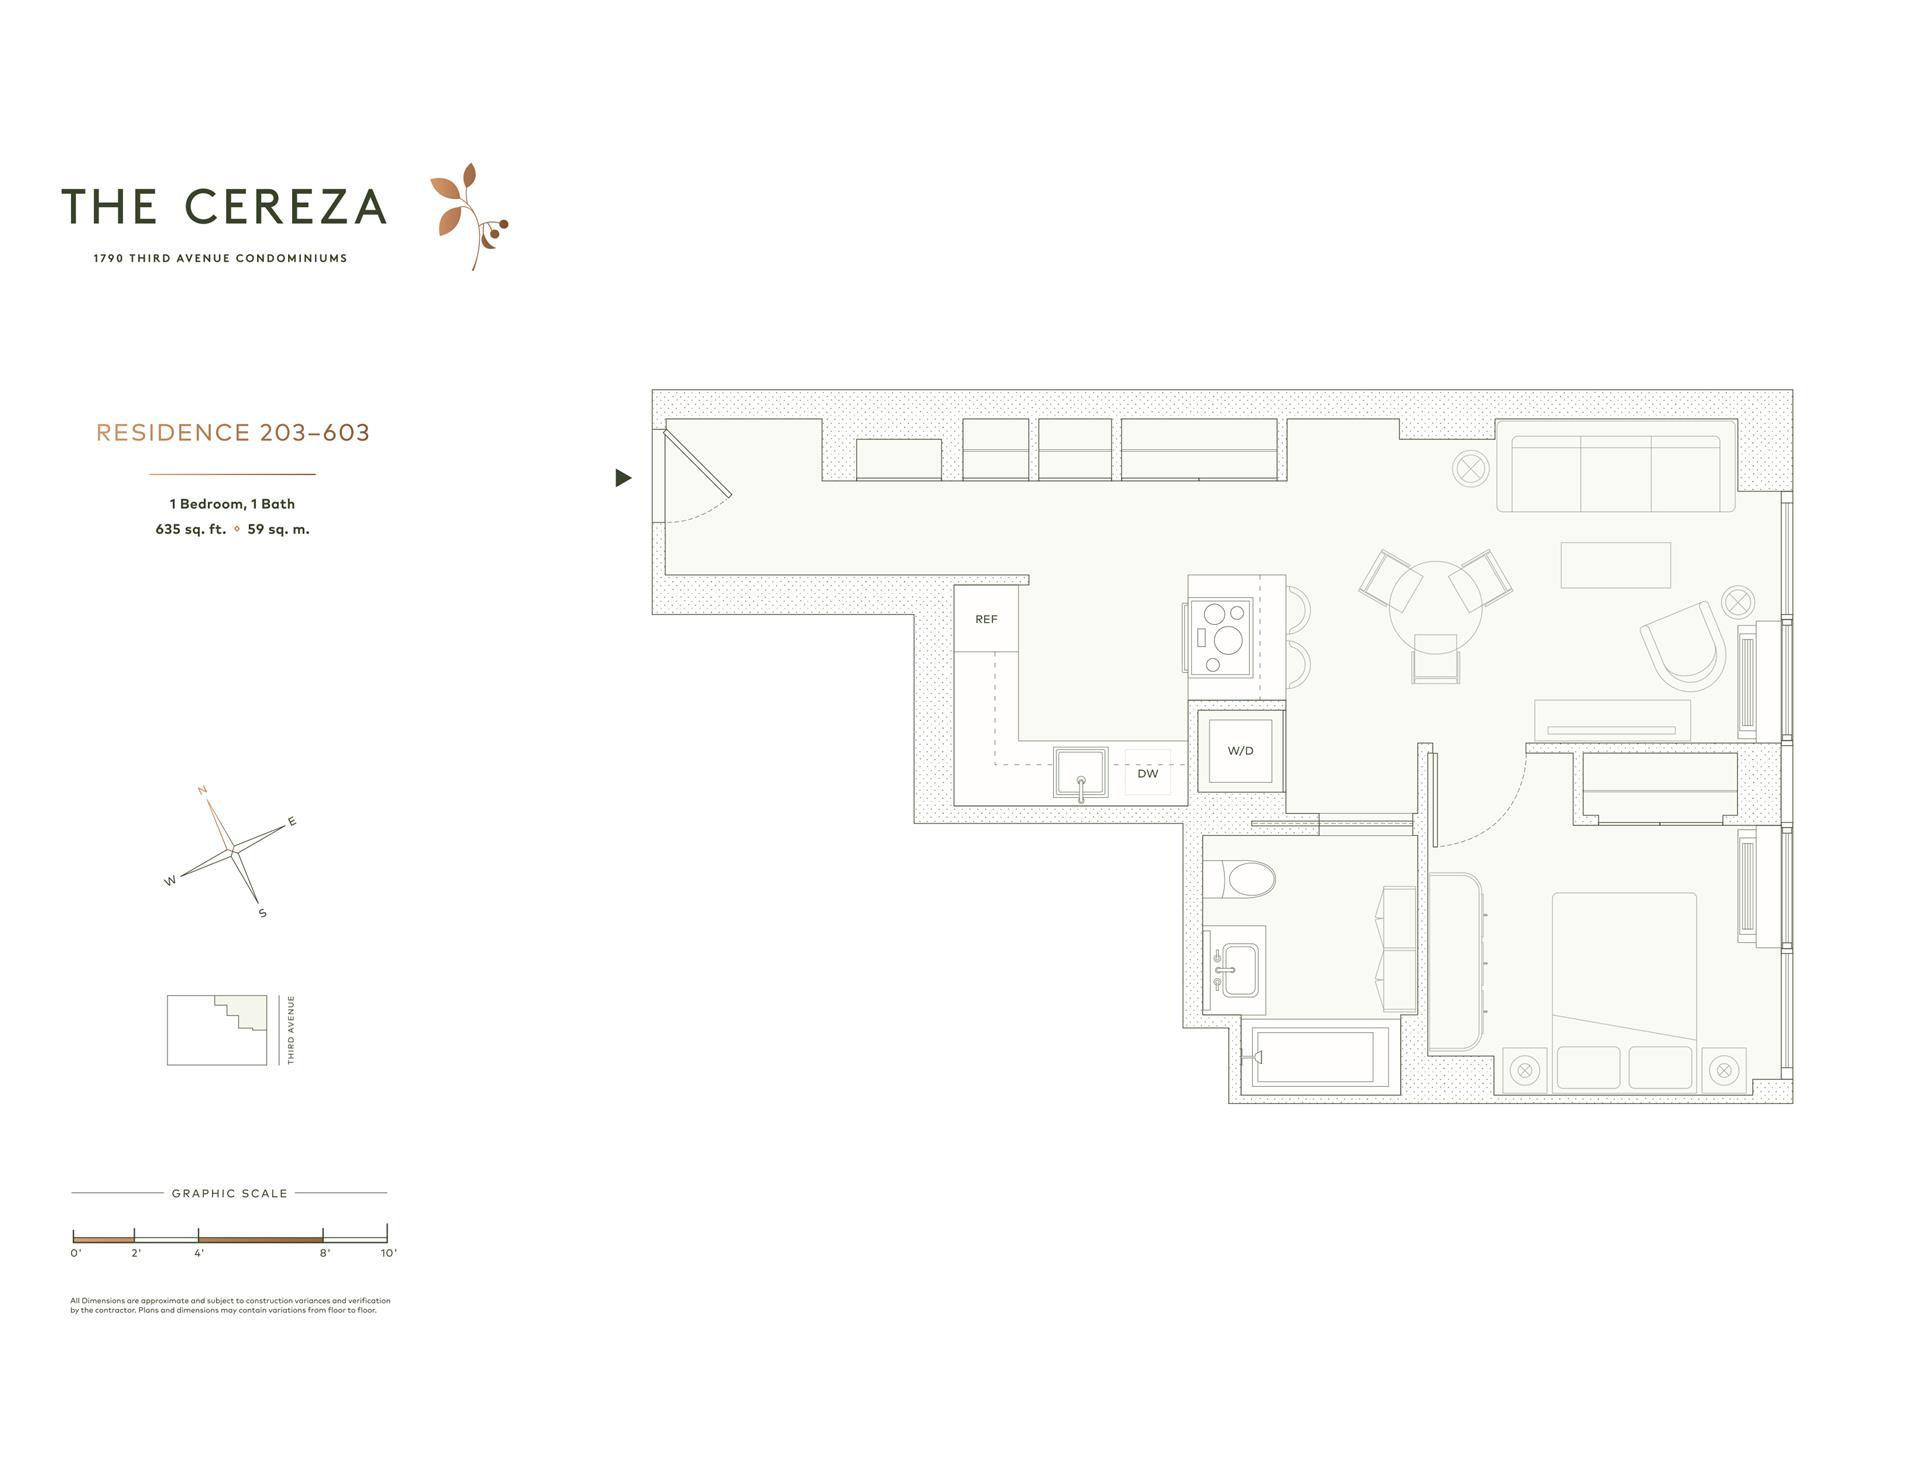 Floor plan of 1790 Third Avenue, 403 - Upper East Side, New York